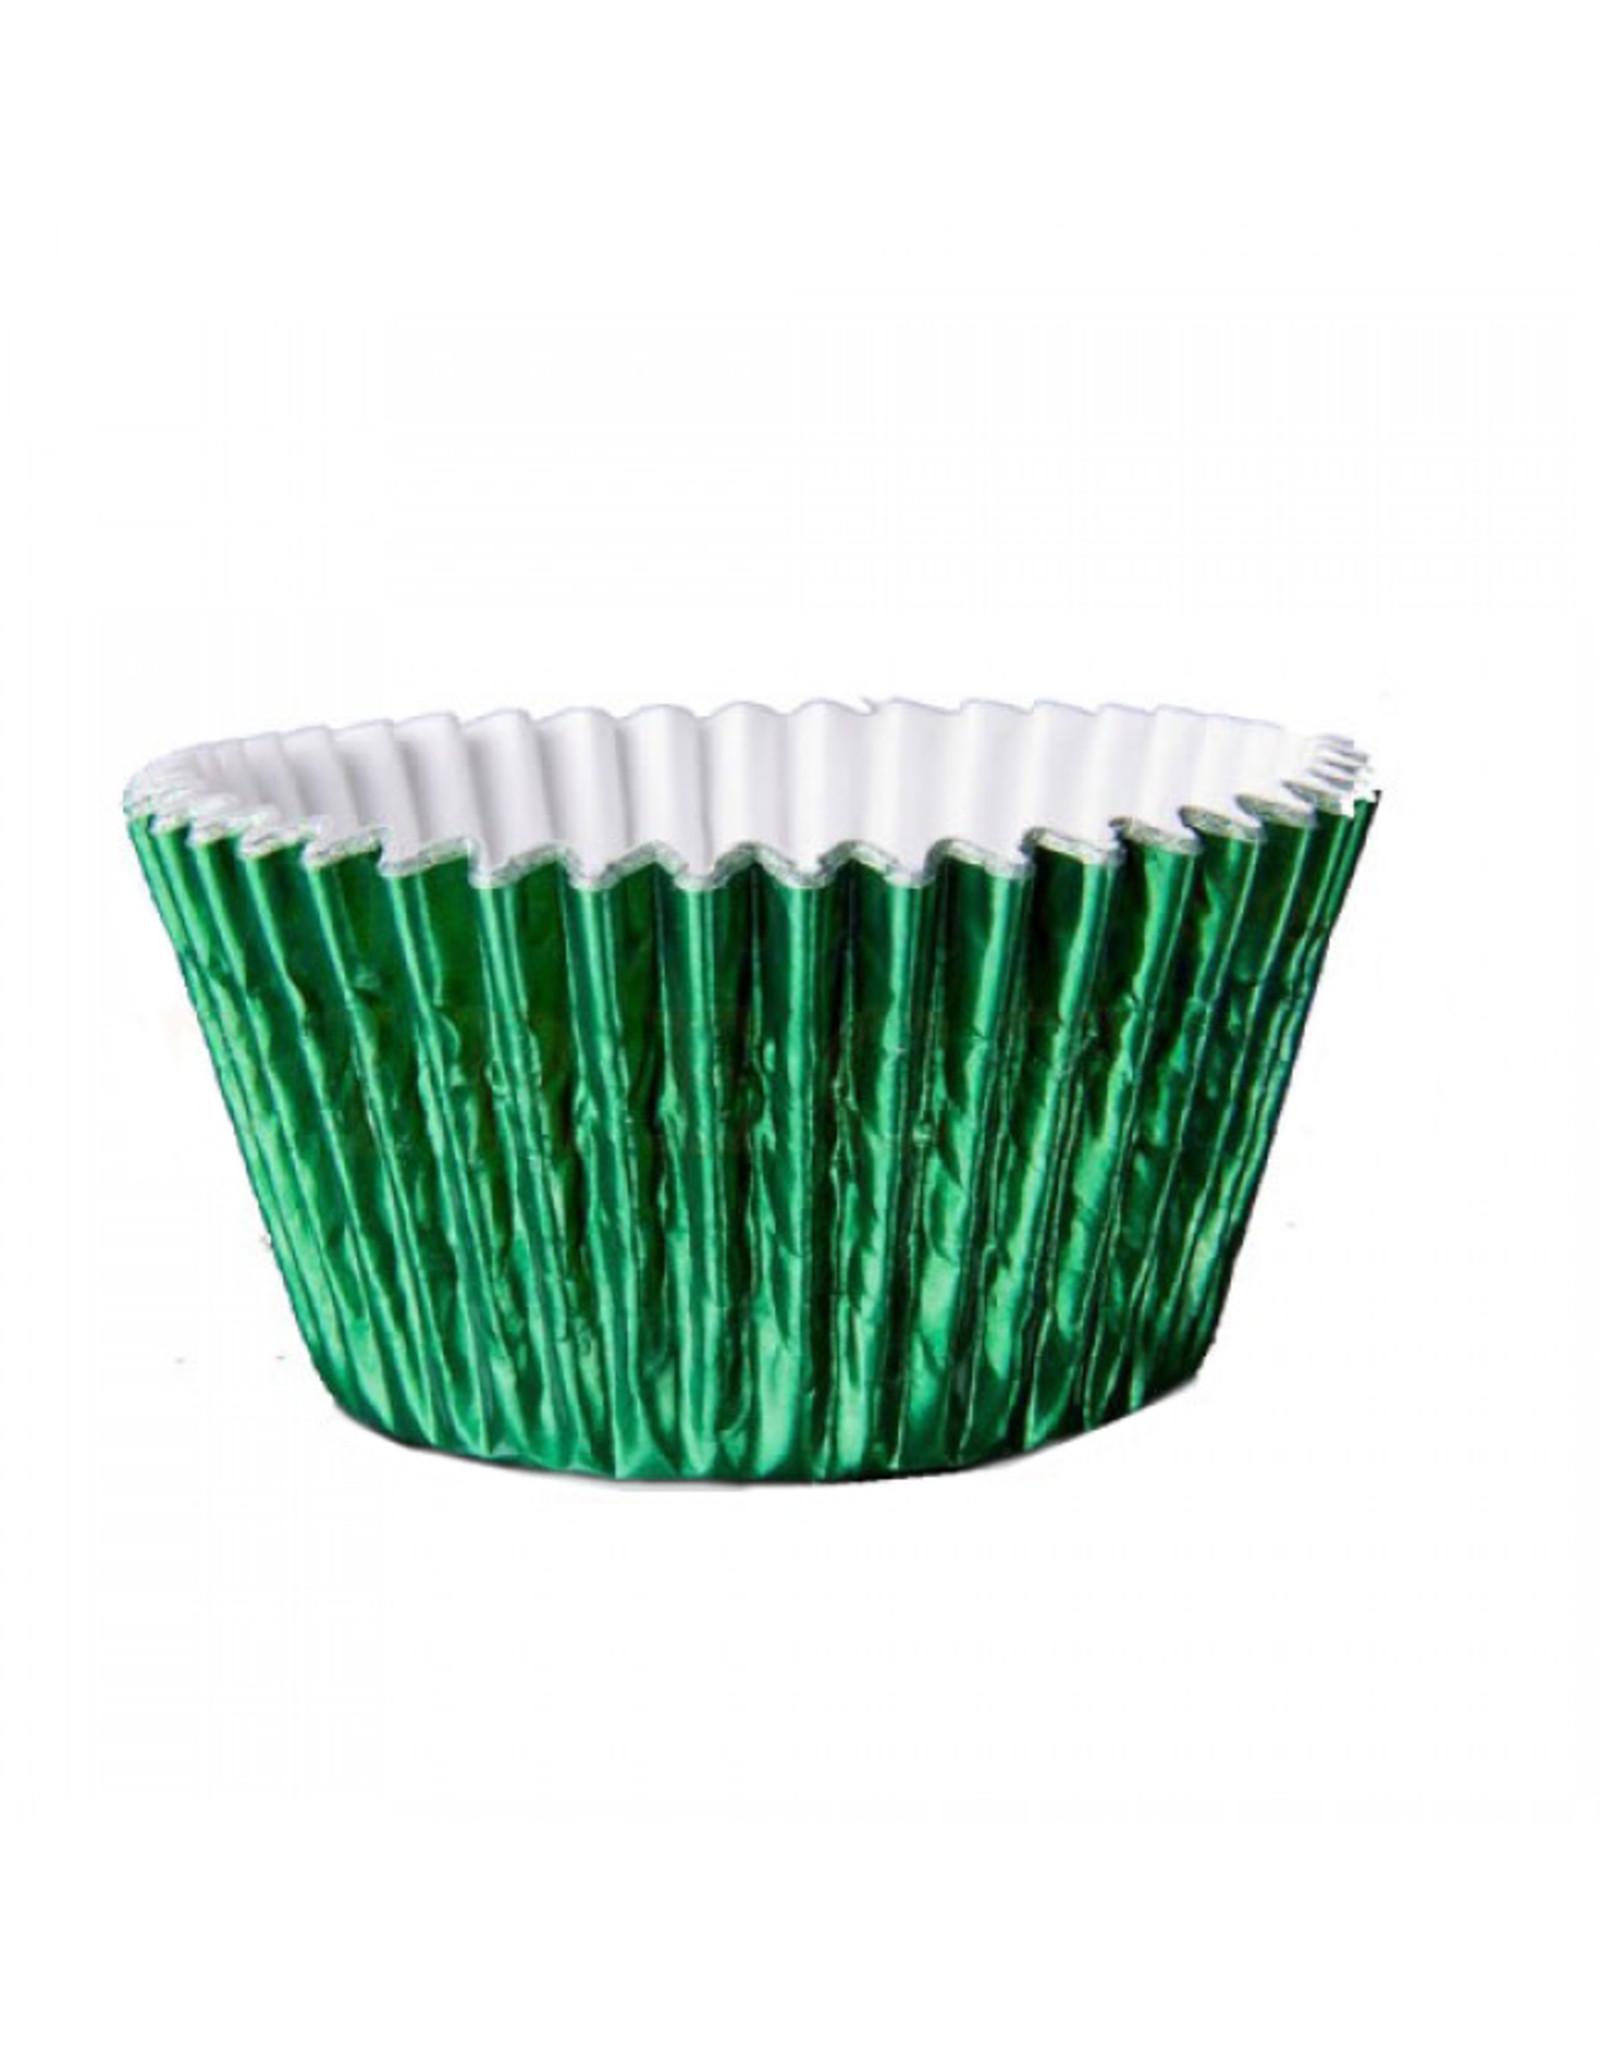 Metallic baking cups - green (500 pieces)